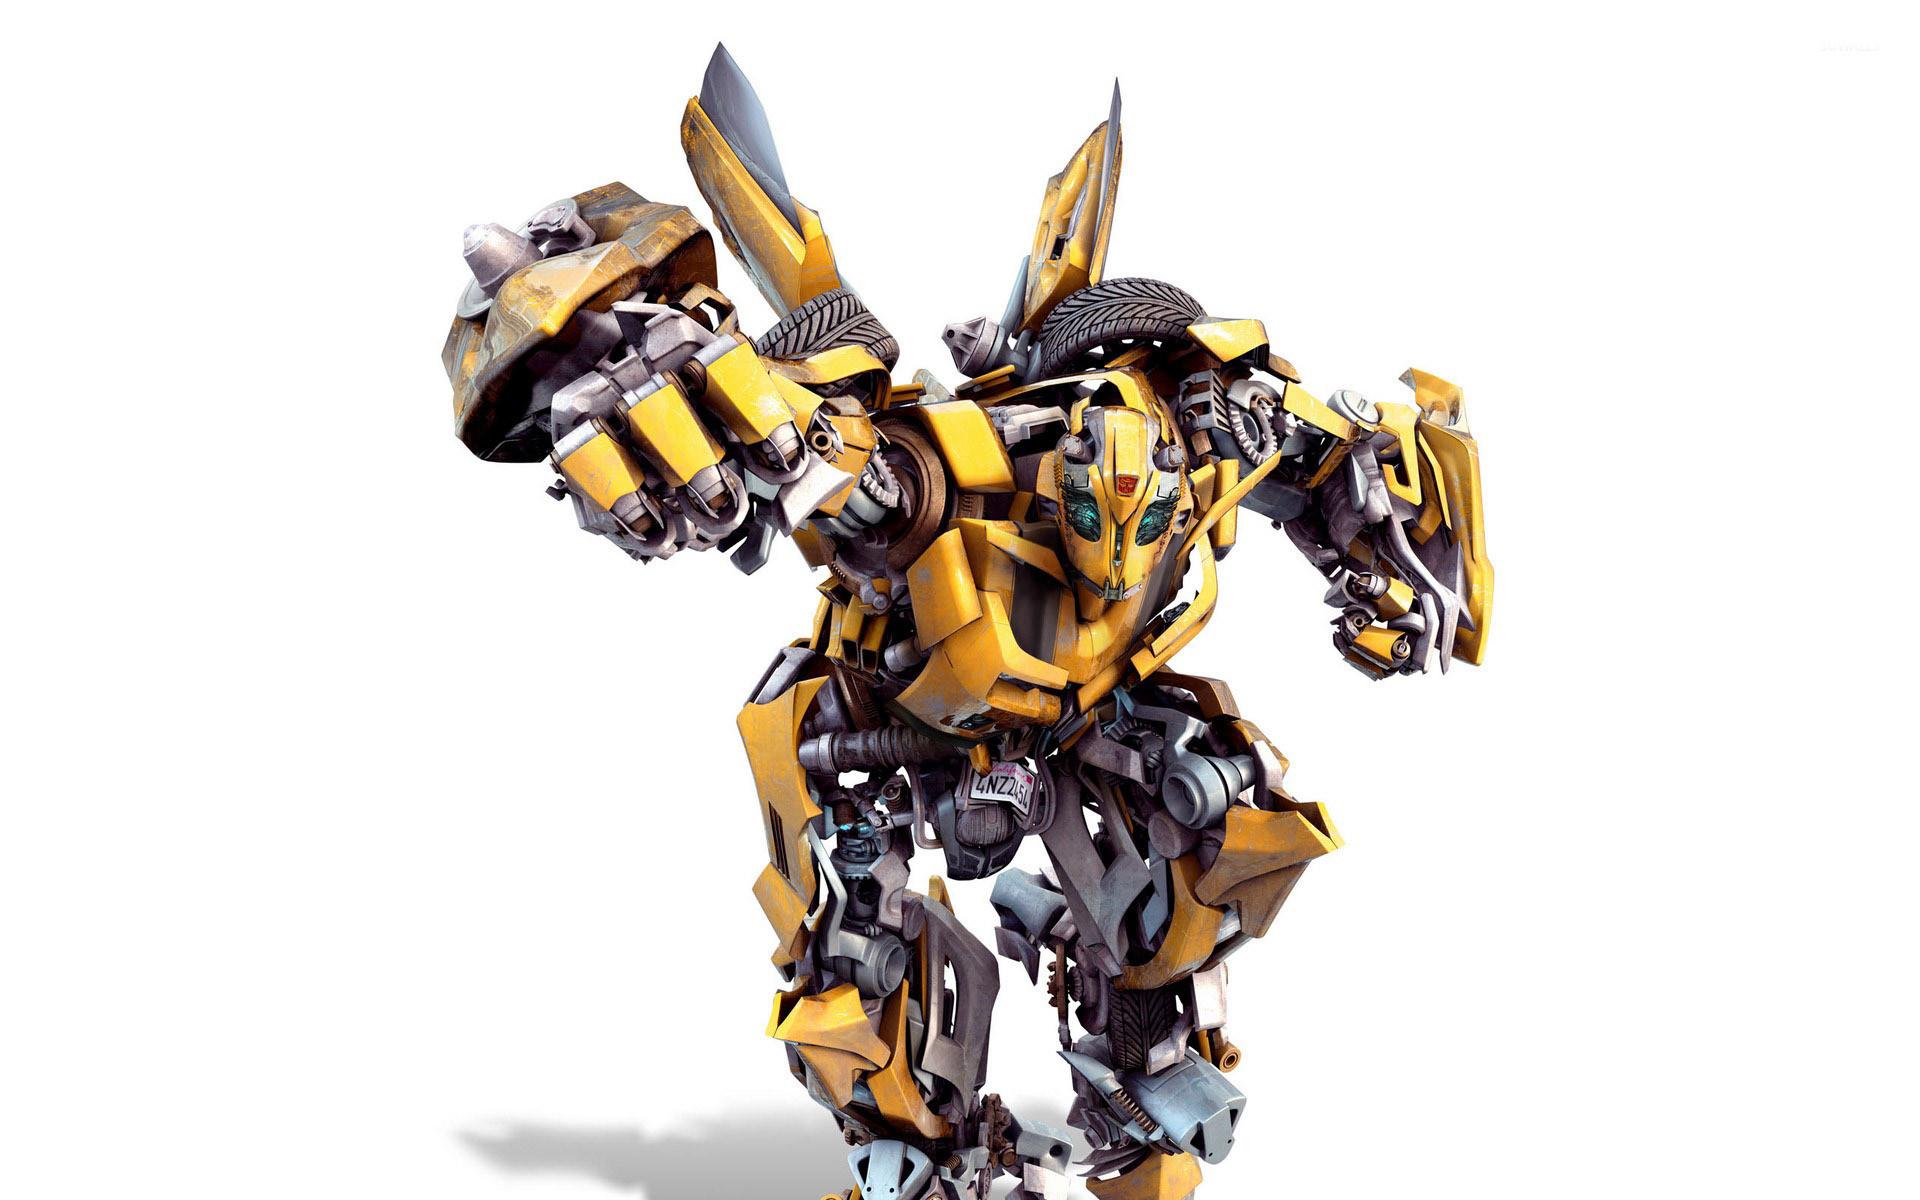 Res: 1920x1200, Bumblebee - Transformers [7] wallpaper